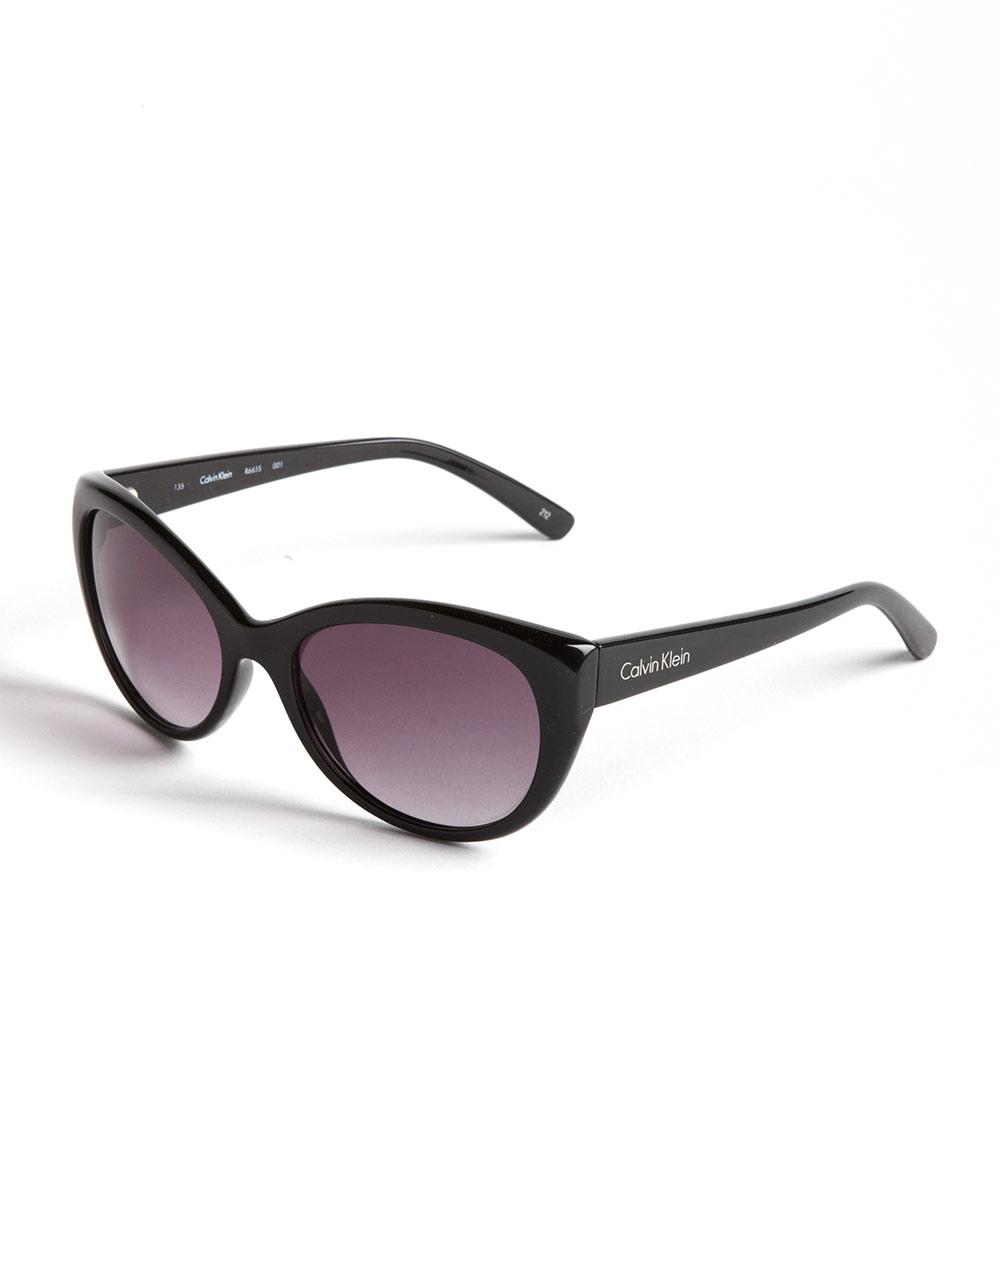 Calvin klein Cat-eye Sunglasses in Black | Lyst